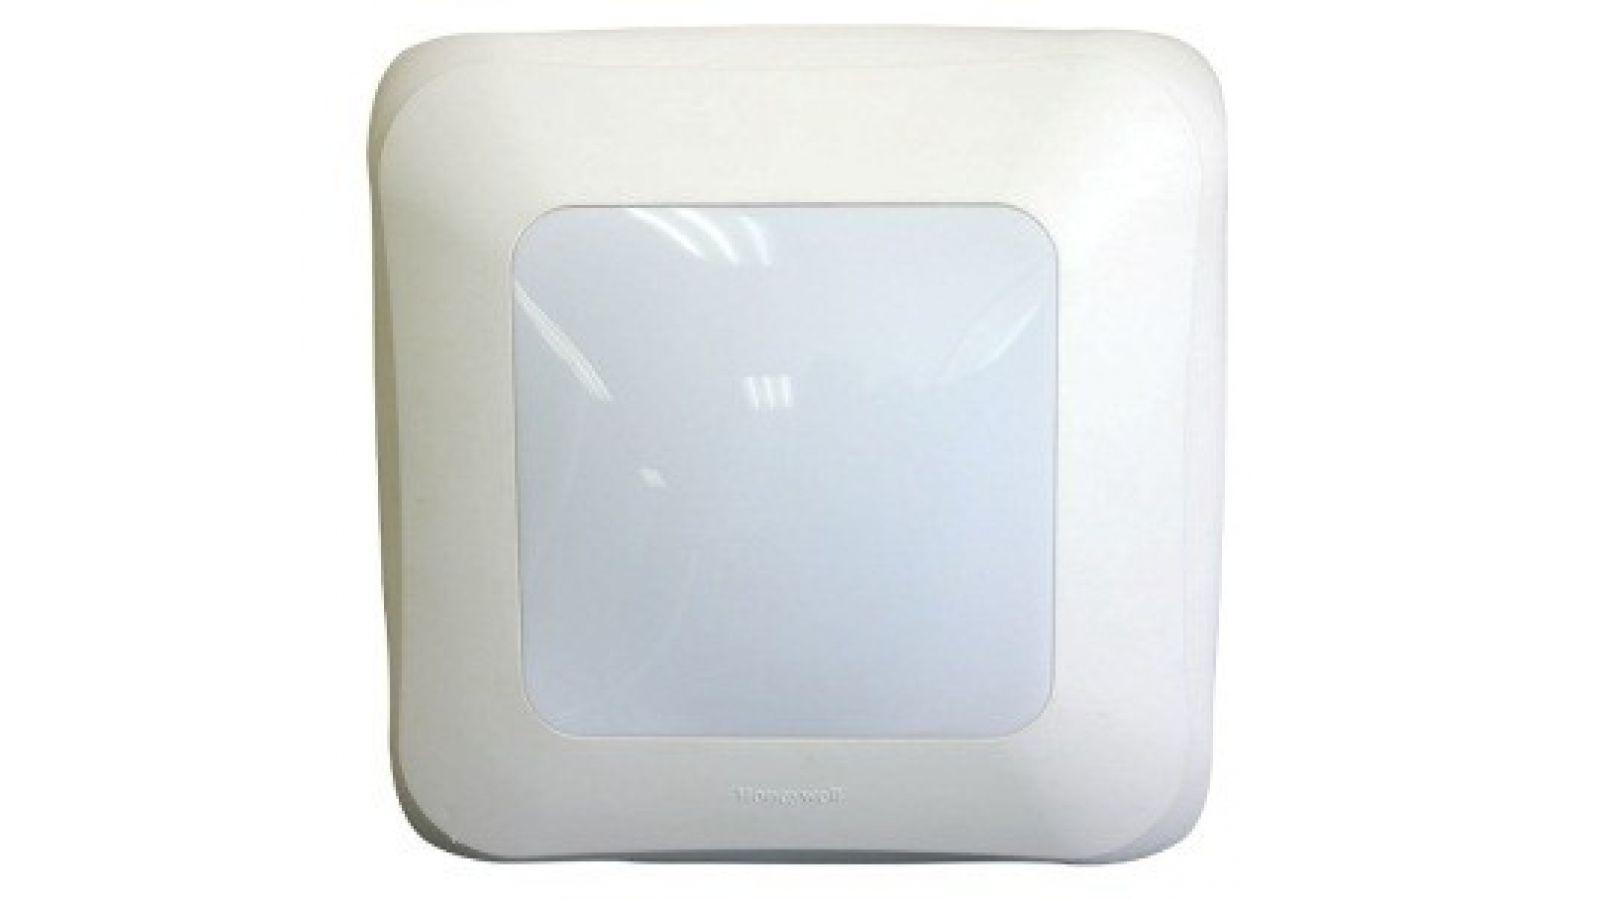 Shelby Ventilation Fan with Light